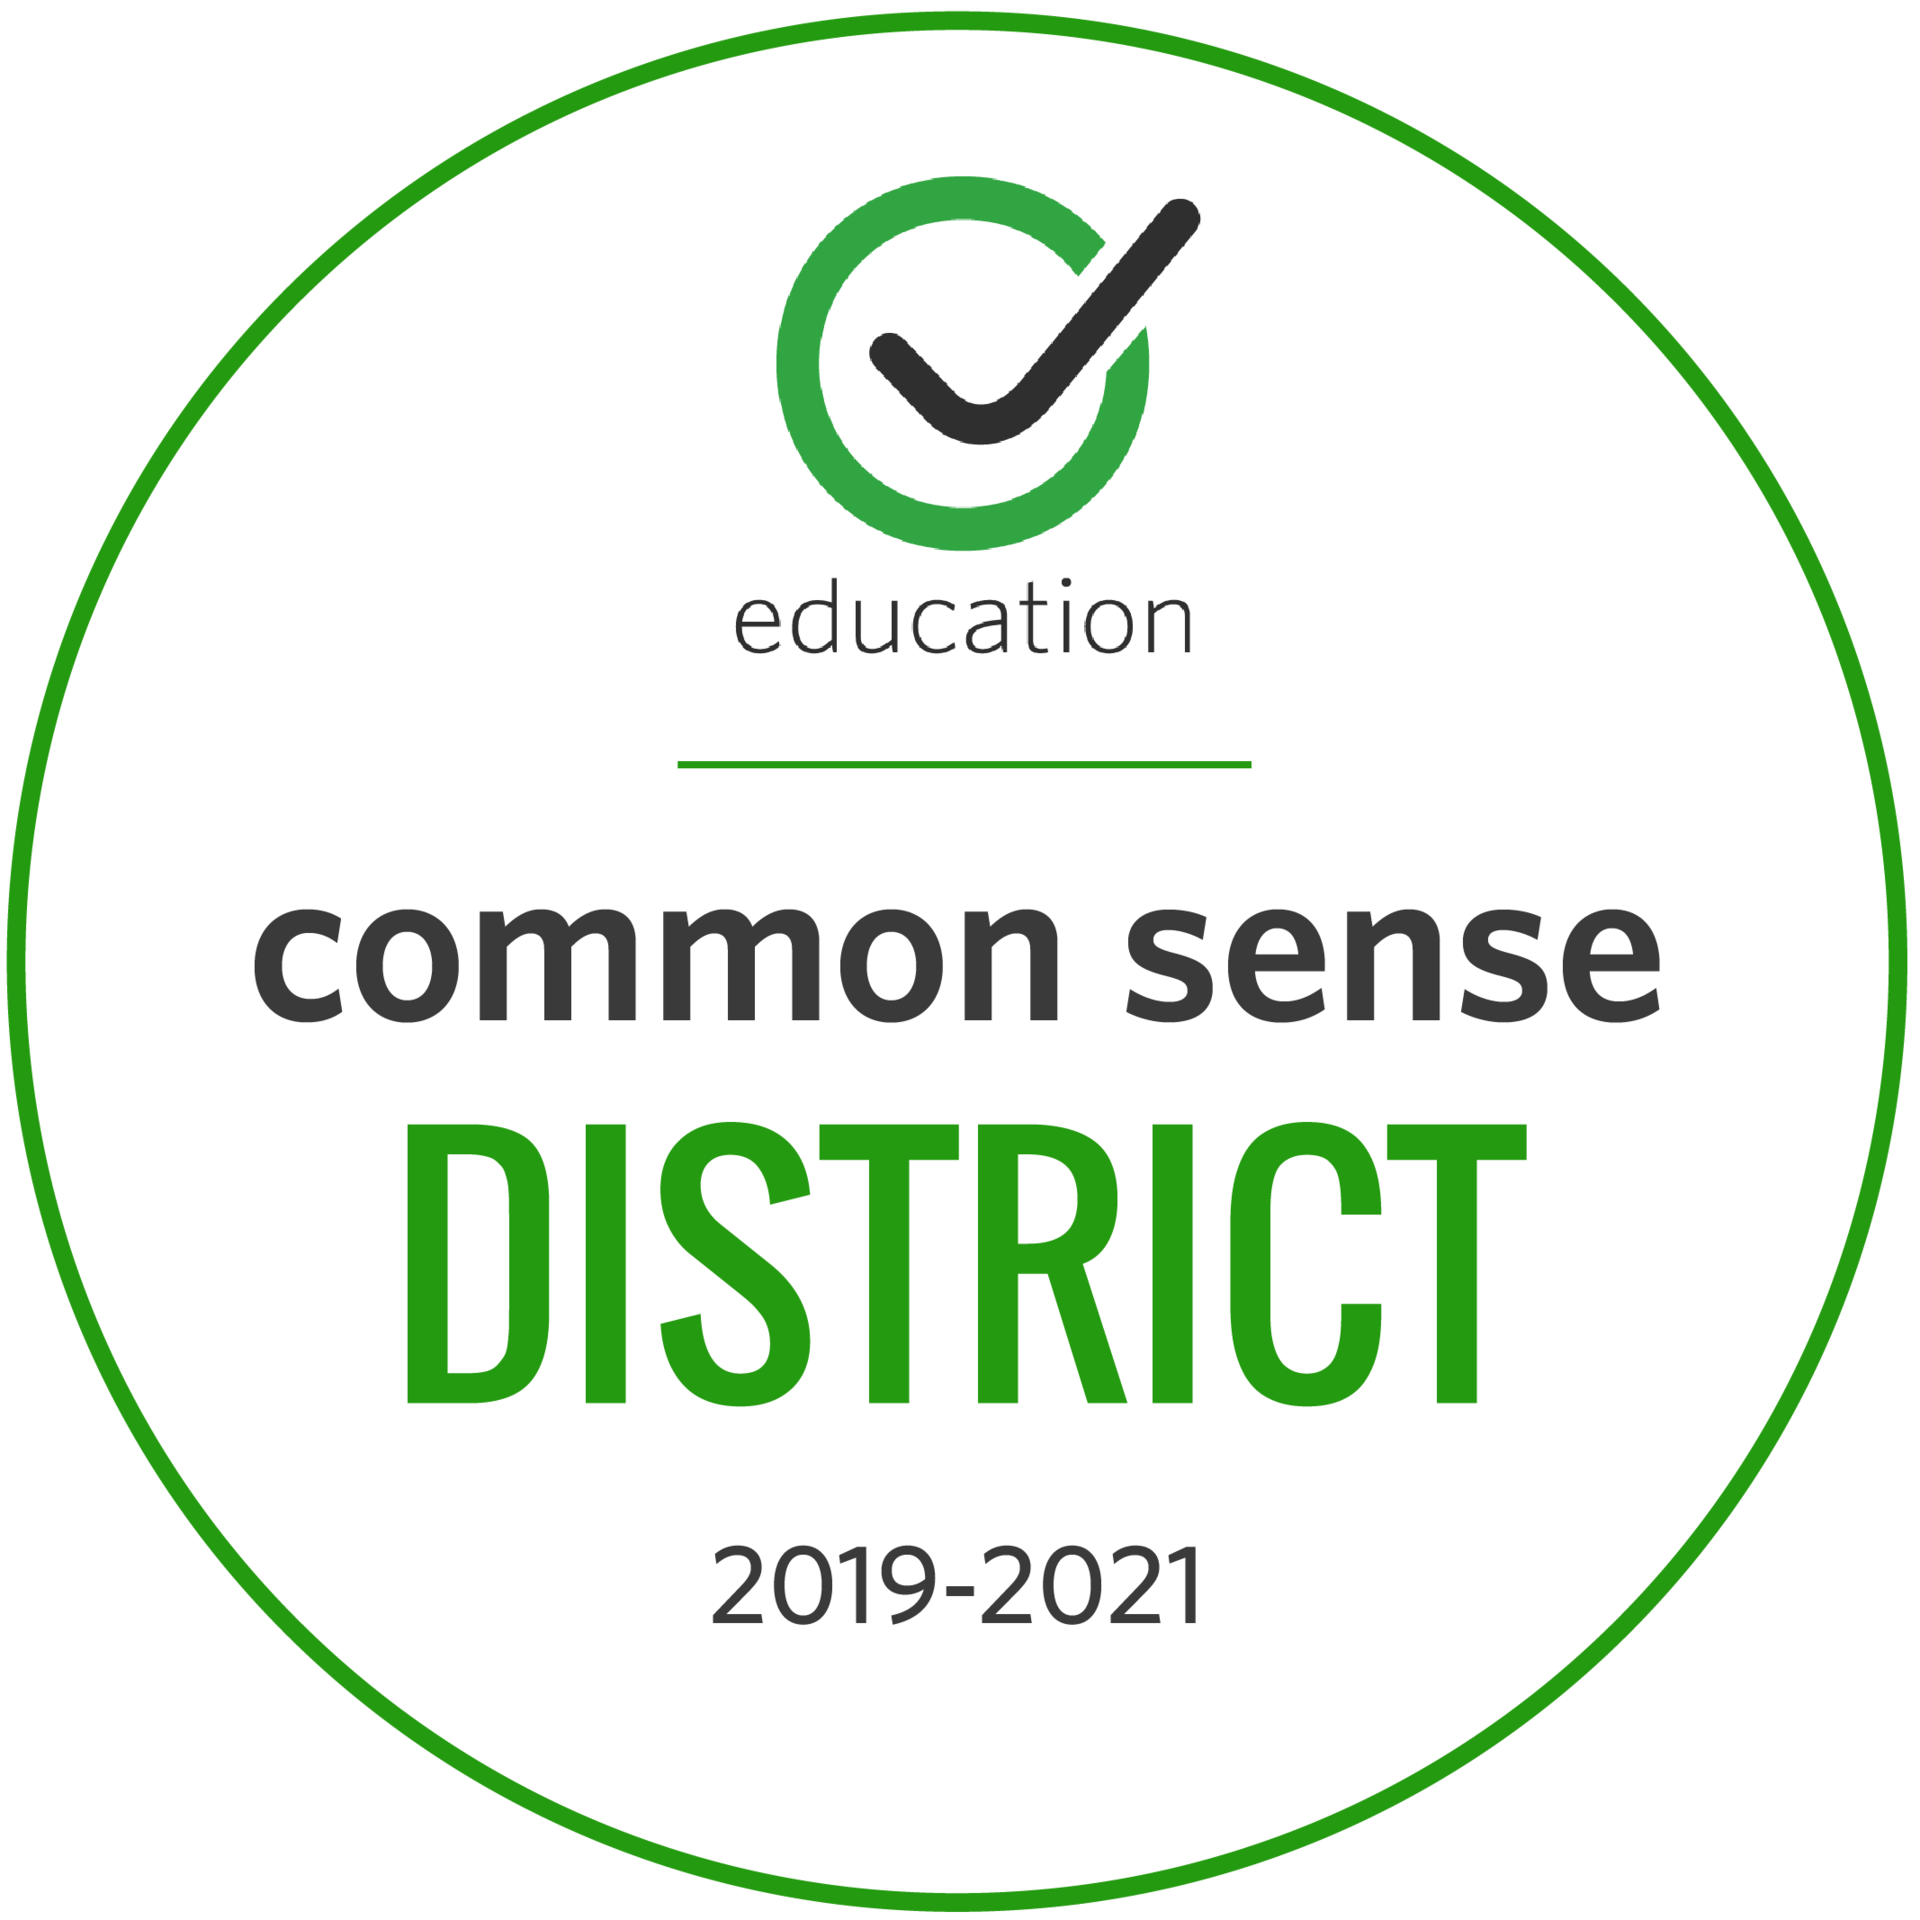 District Recognition